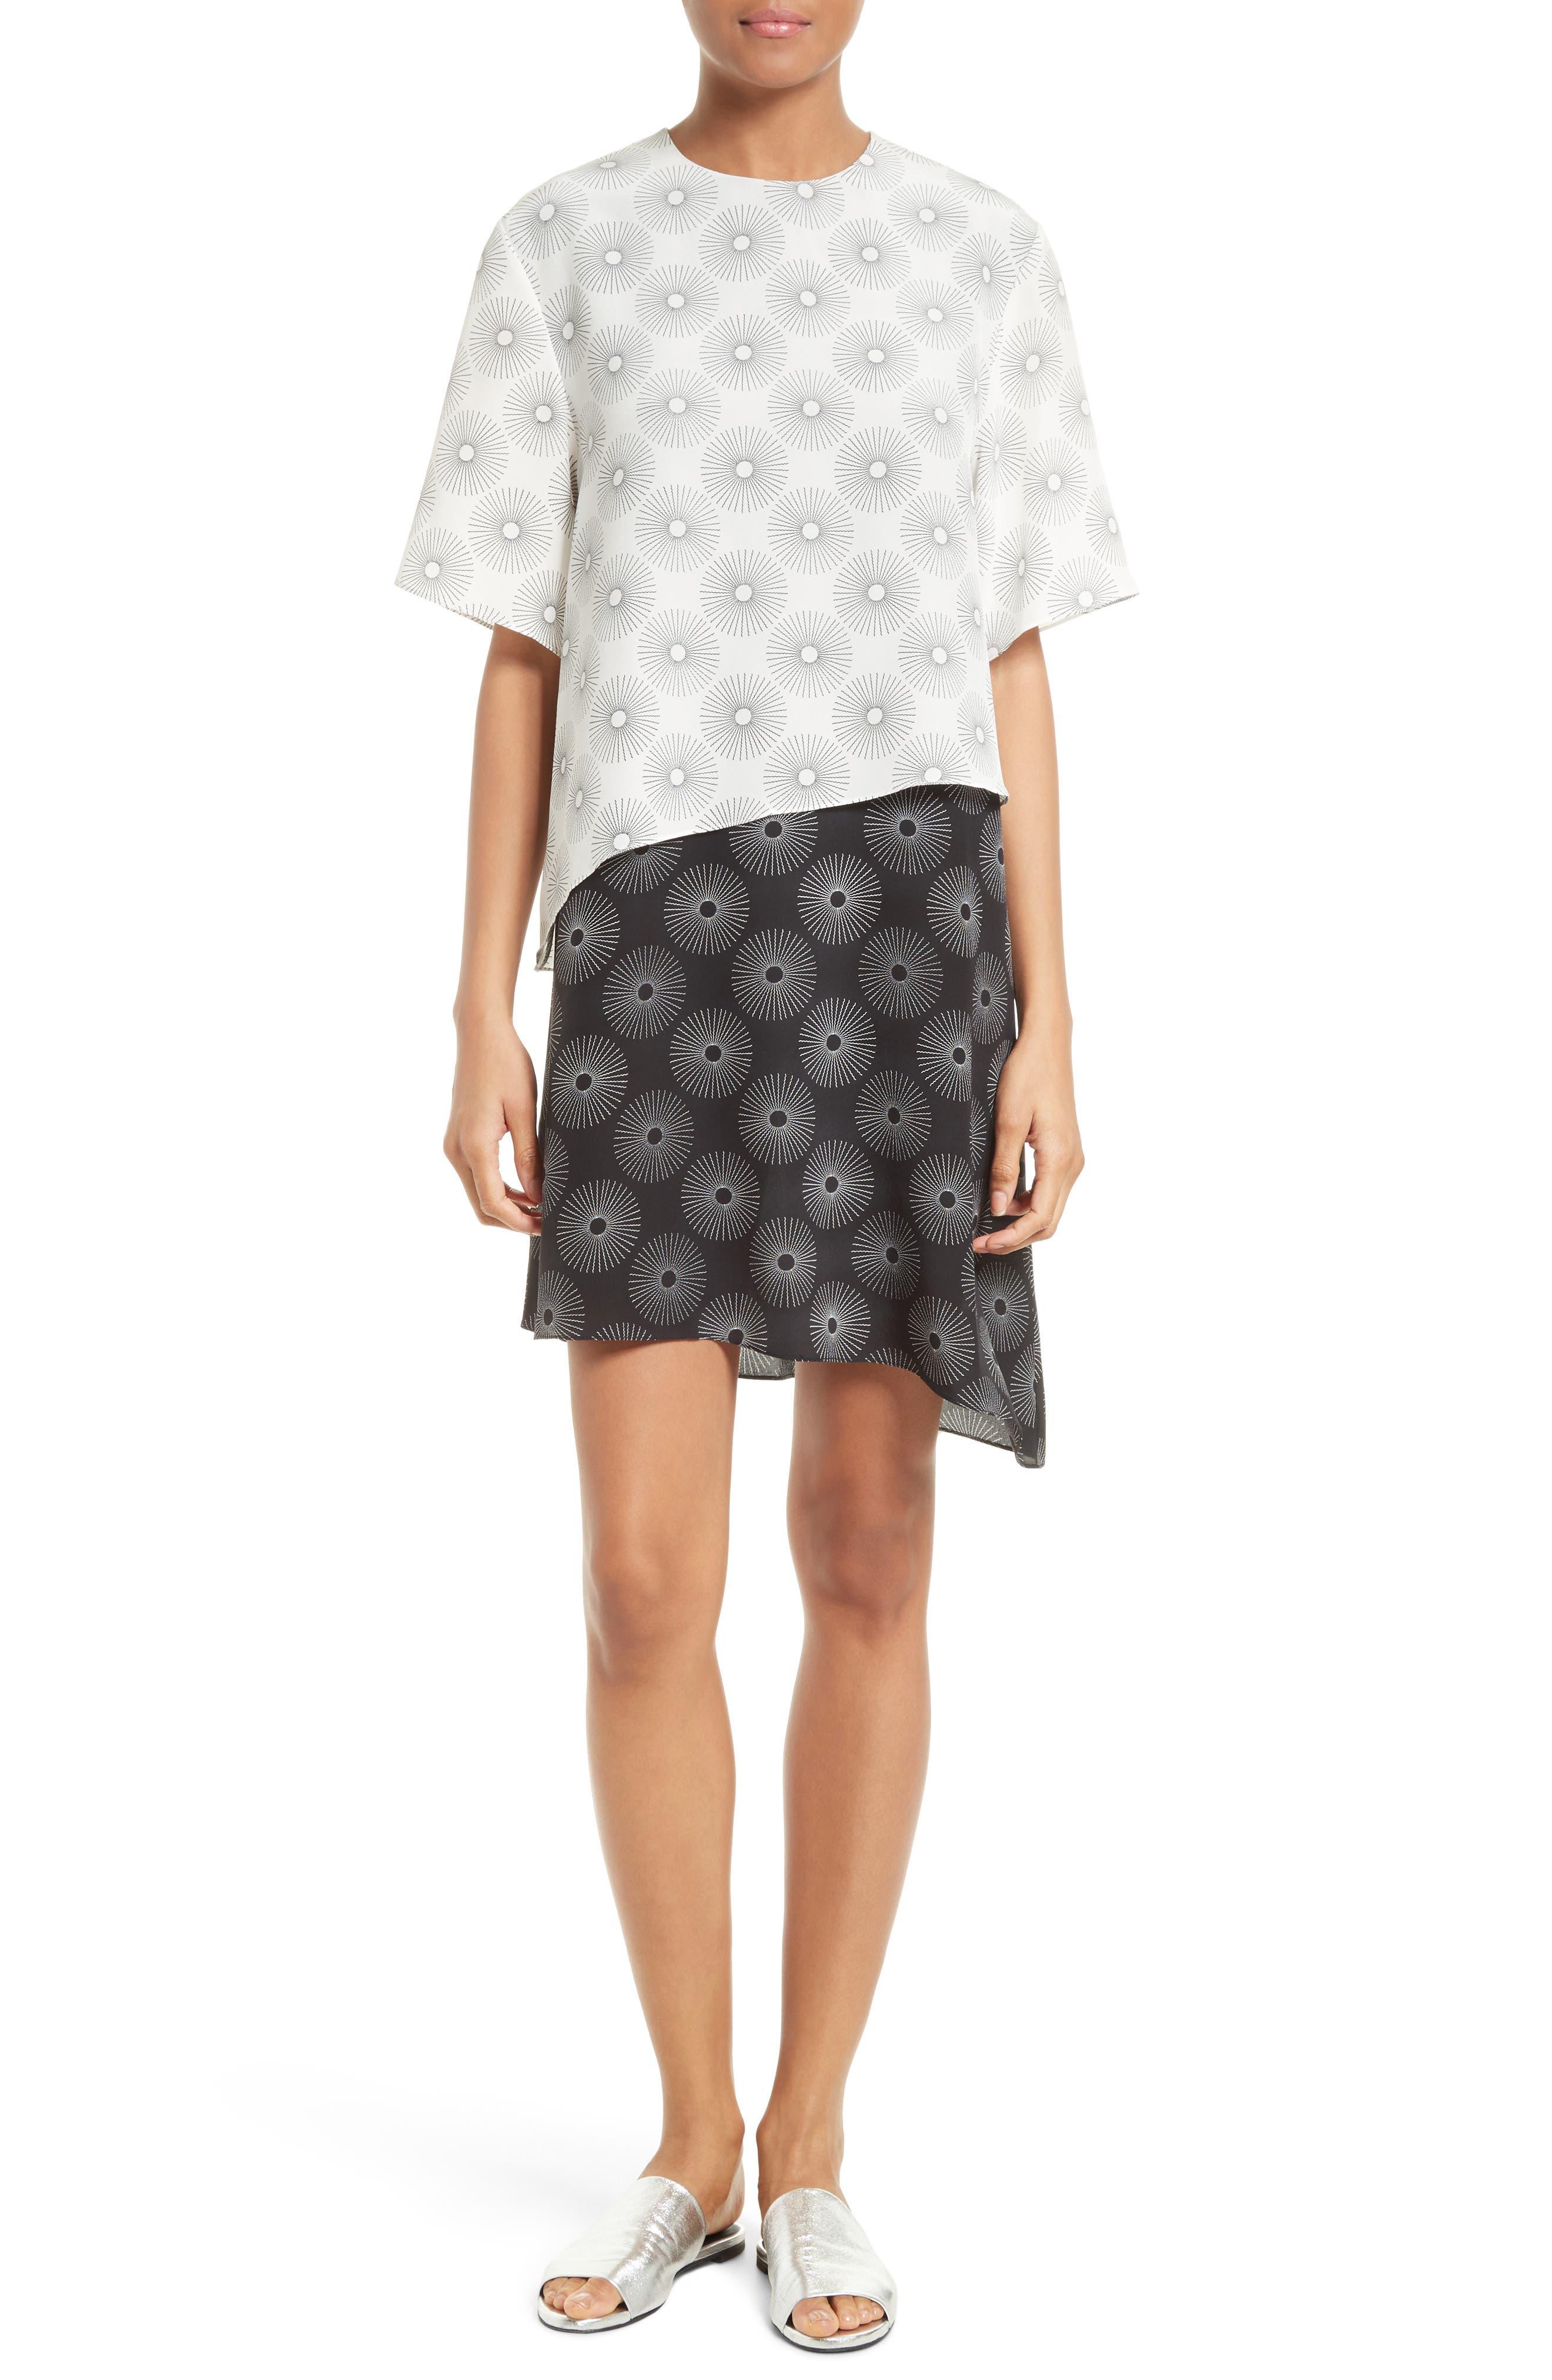 Alternate Image 1 Selected - Diane von Furstenberg Silk Shift Dress